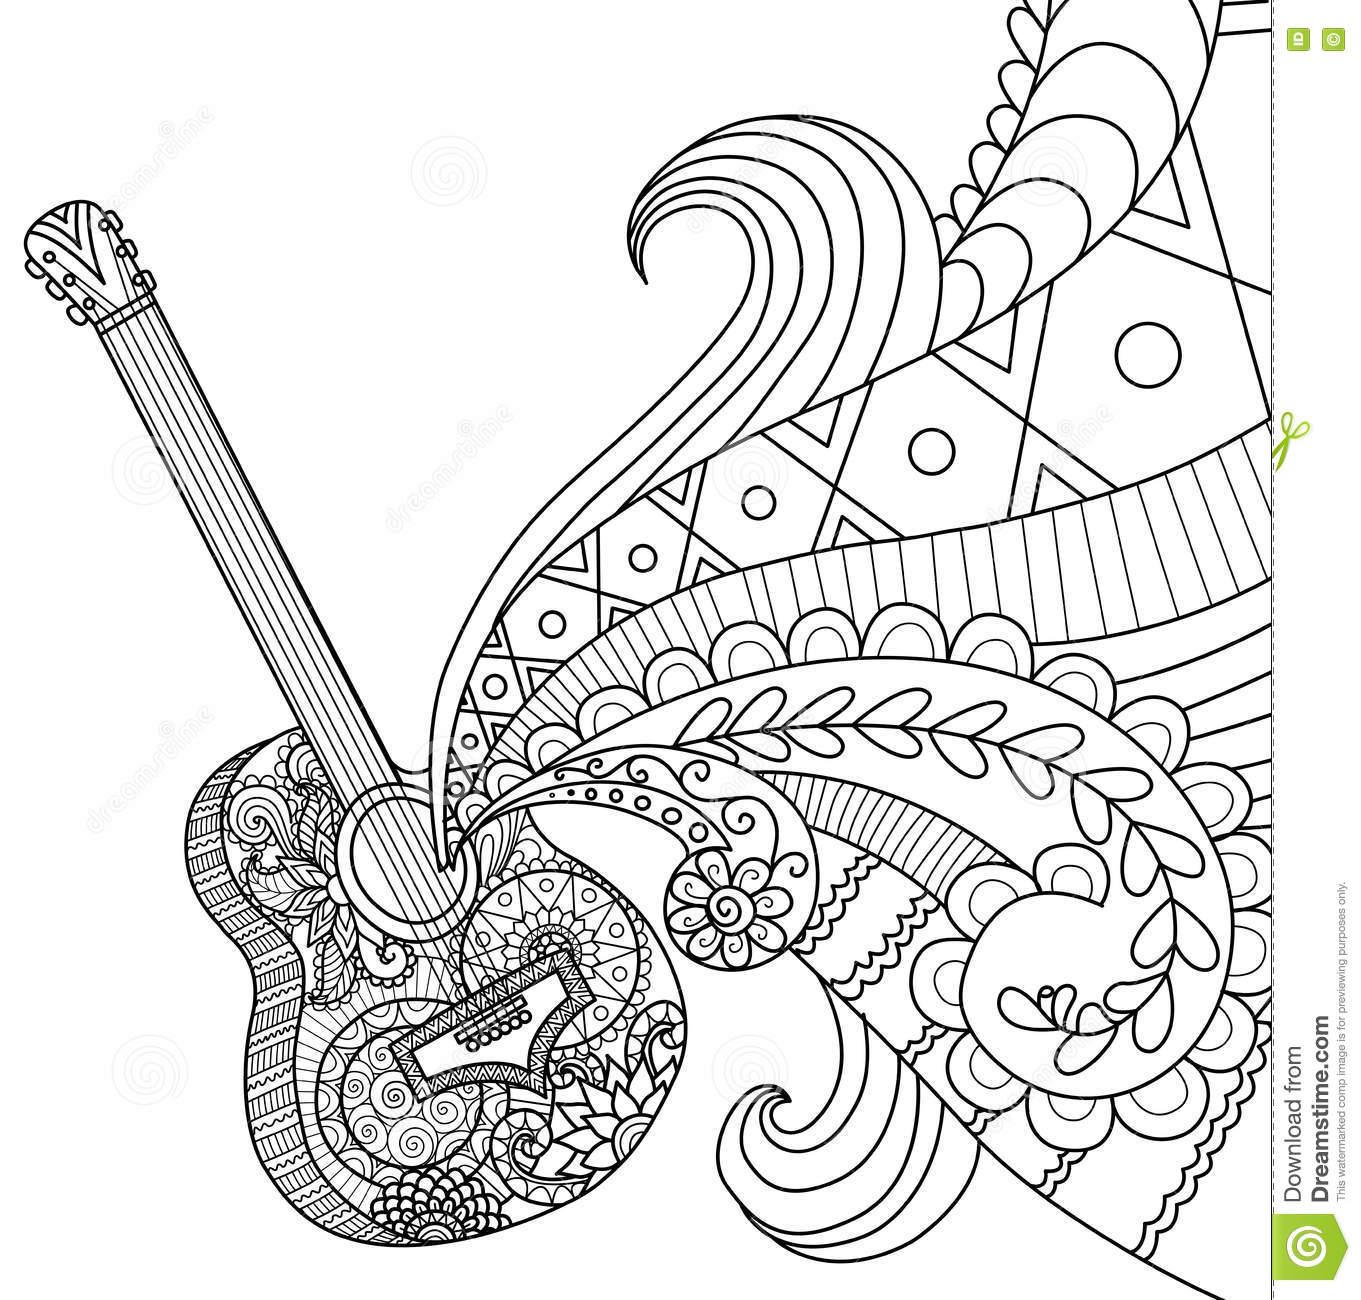 Guitar Coloring Page At Getcolorings